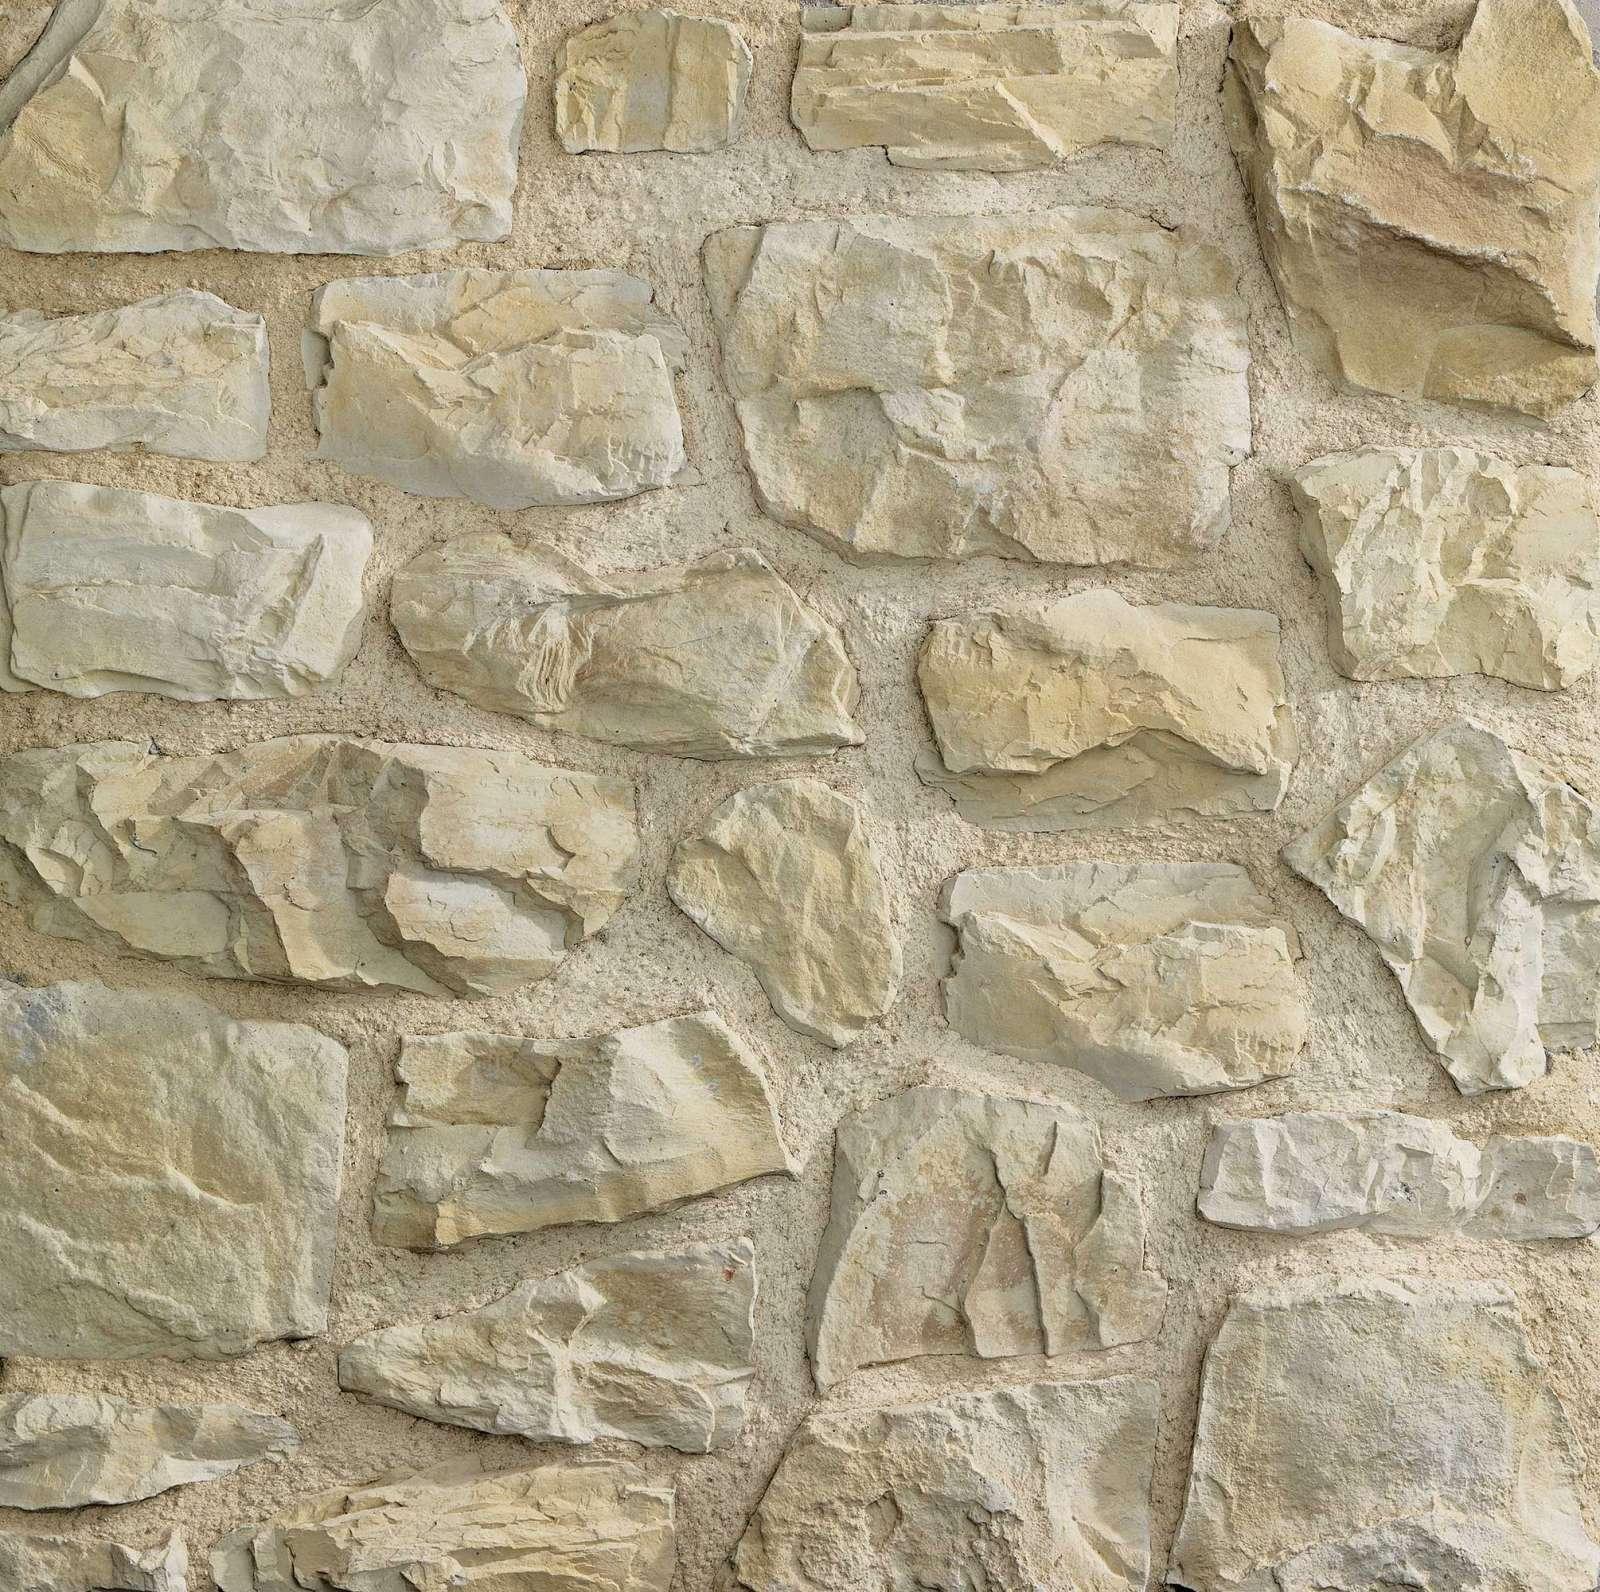 Avignone origine pietra - Pietra per interni ...